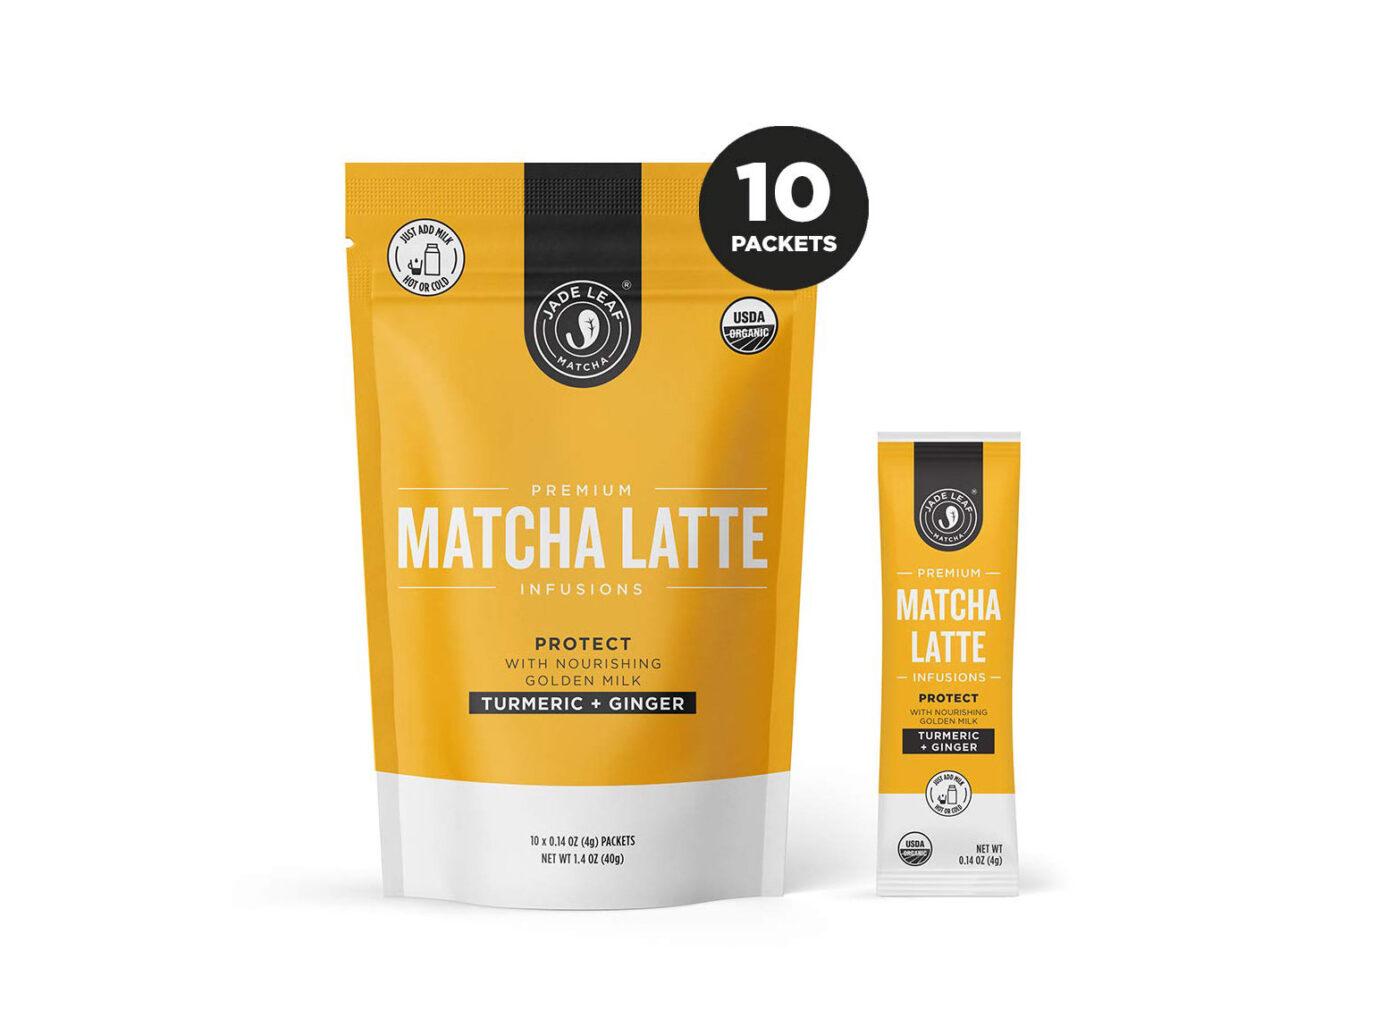 Jade Leaf Matcha Latte Infusions